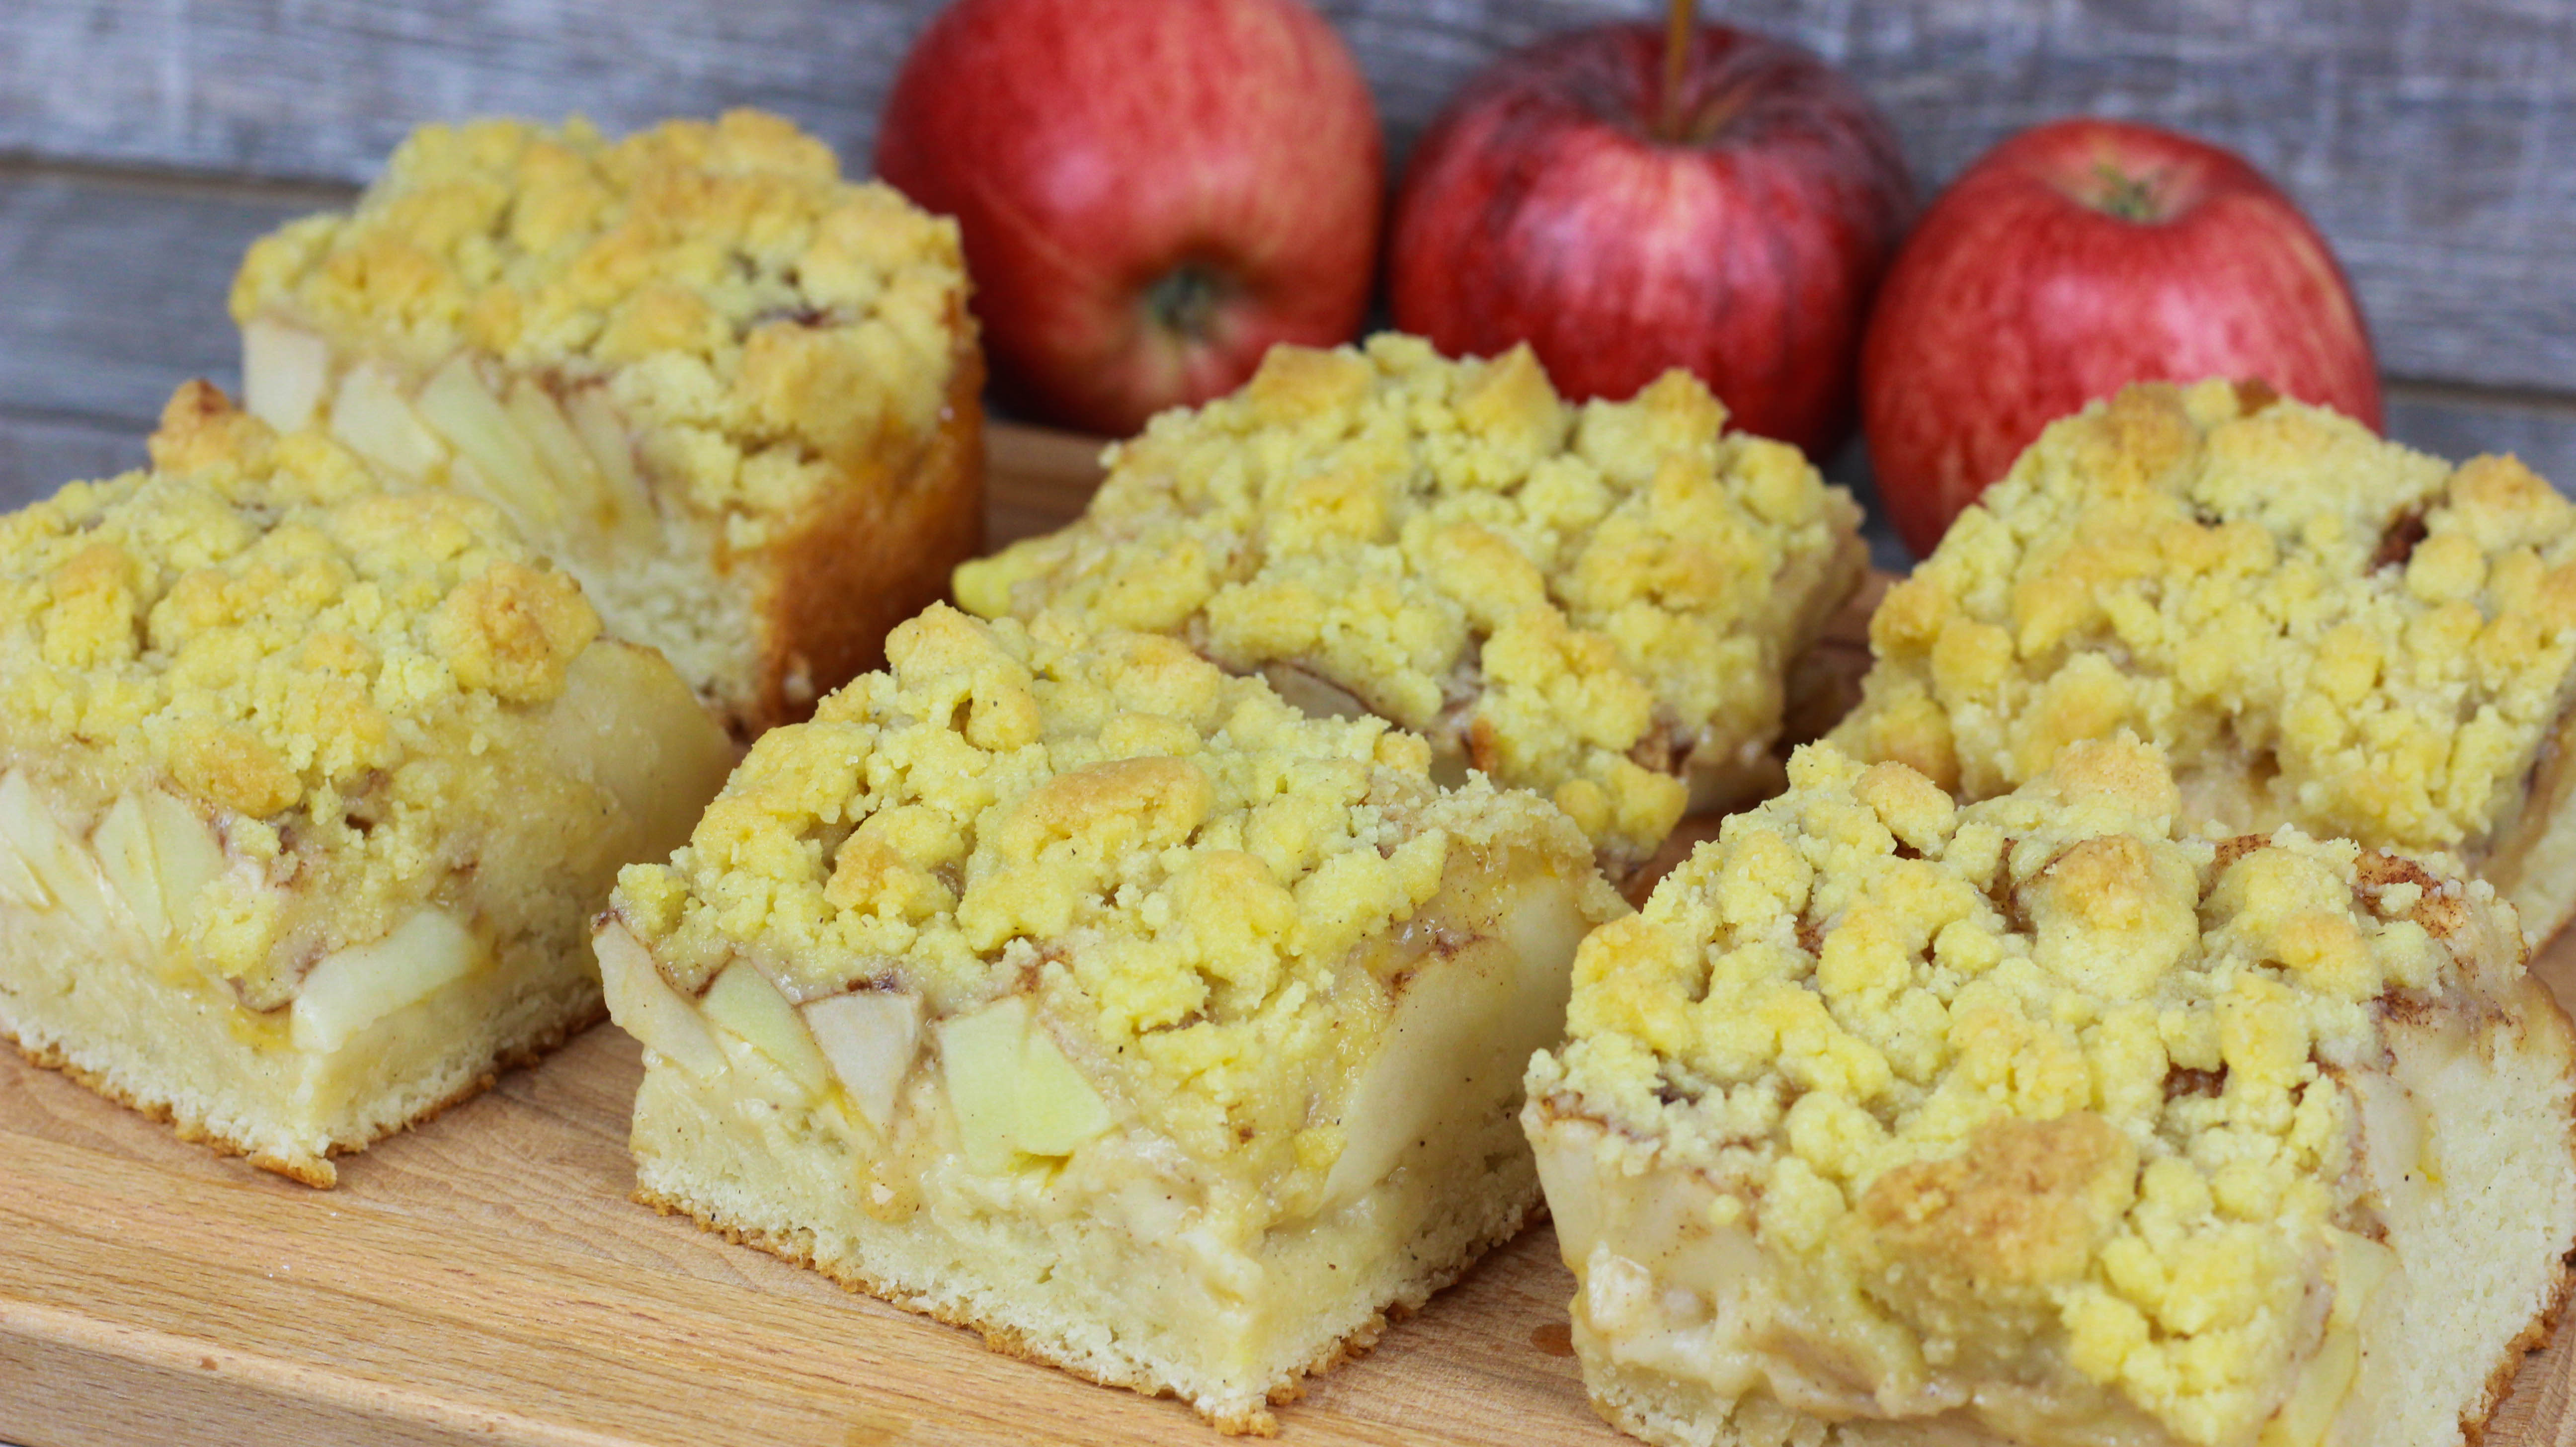 Saftiger Apfel Streuselkuchen Mit Quark Ol Teig Cook Bakery